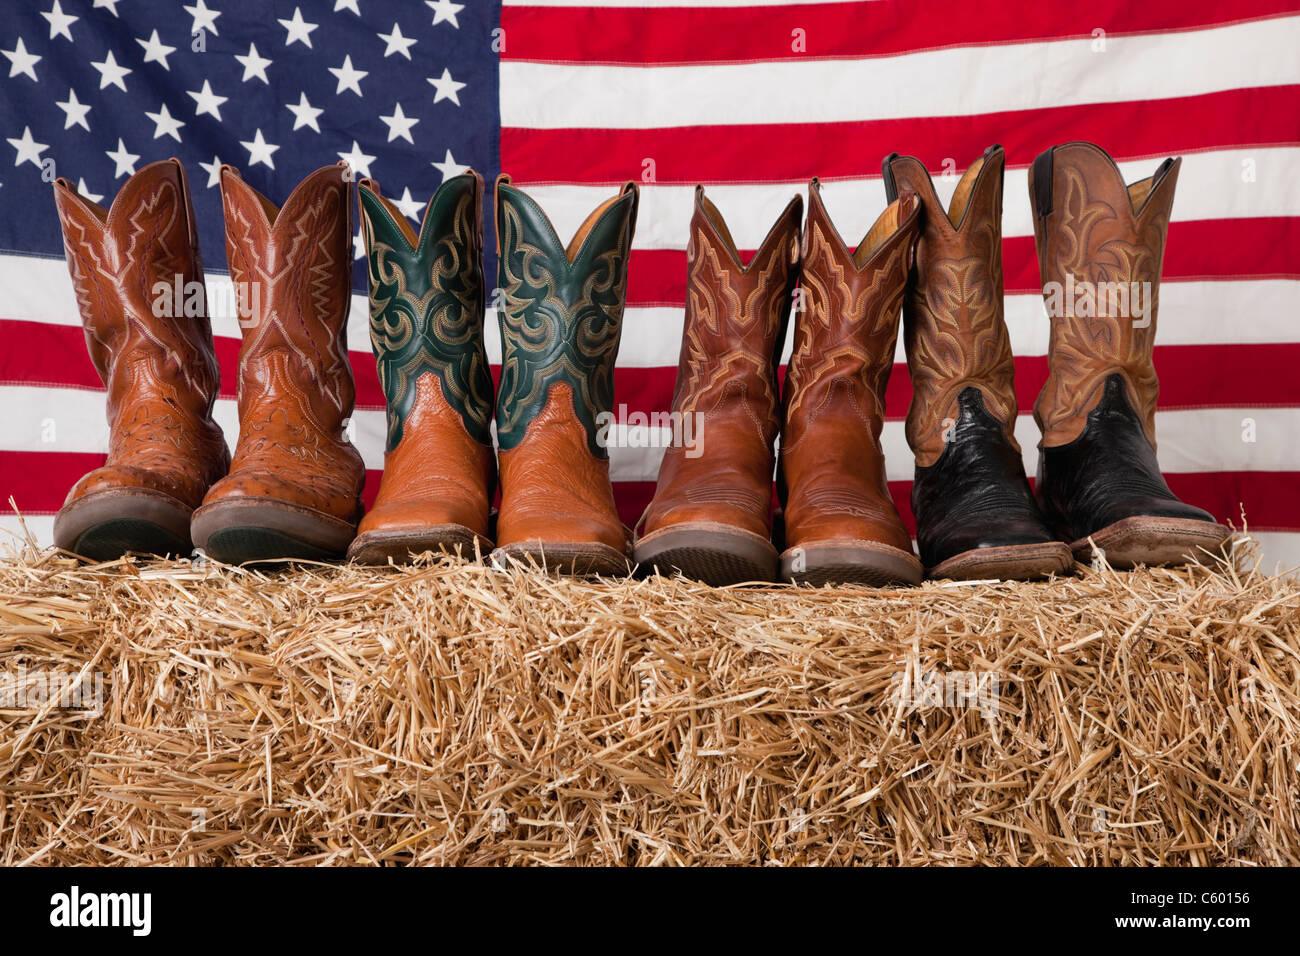 USA, Illinois, Metamora, Row of cowboy boots on haystack